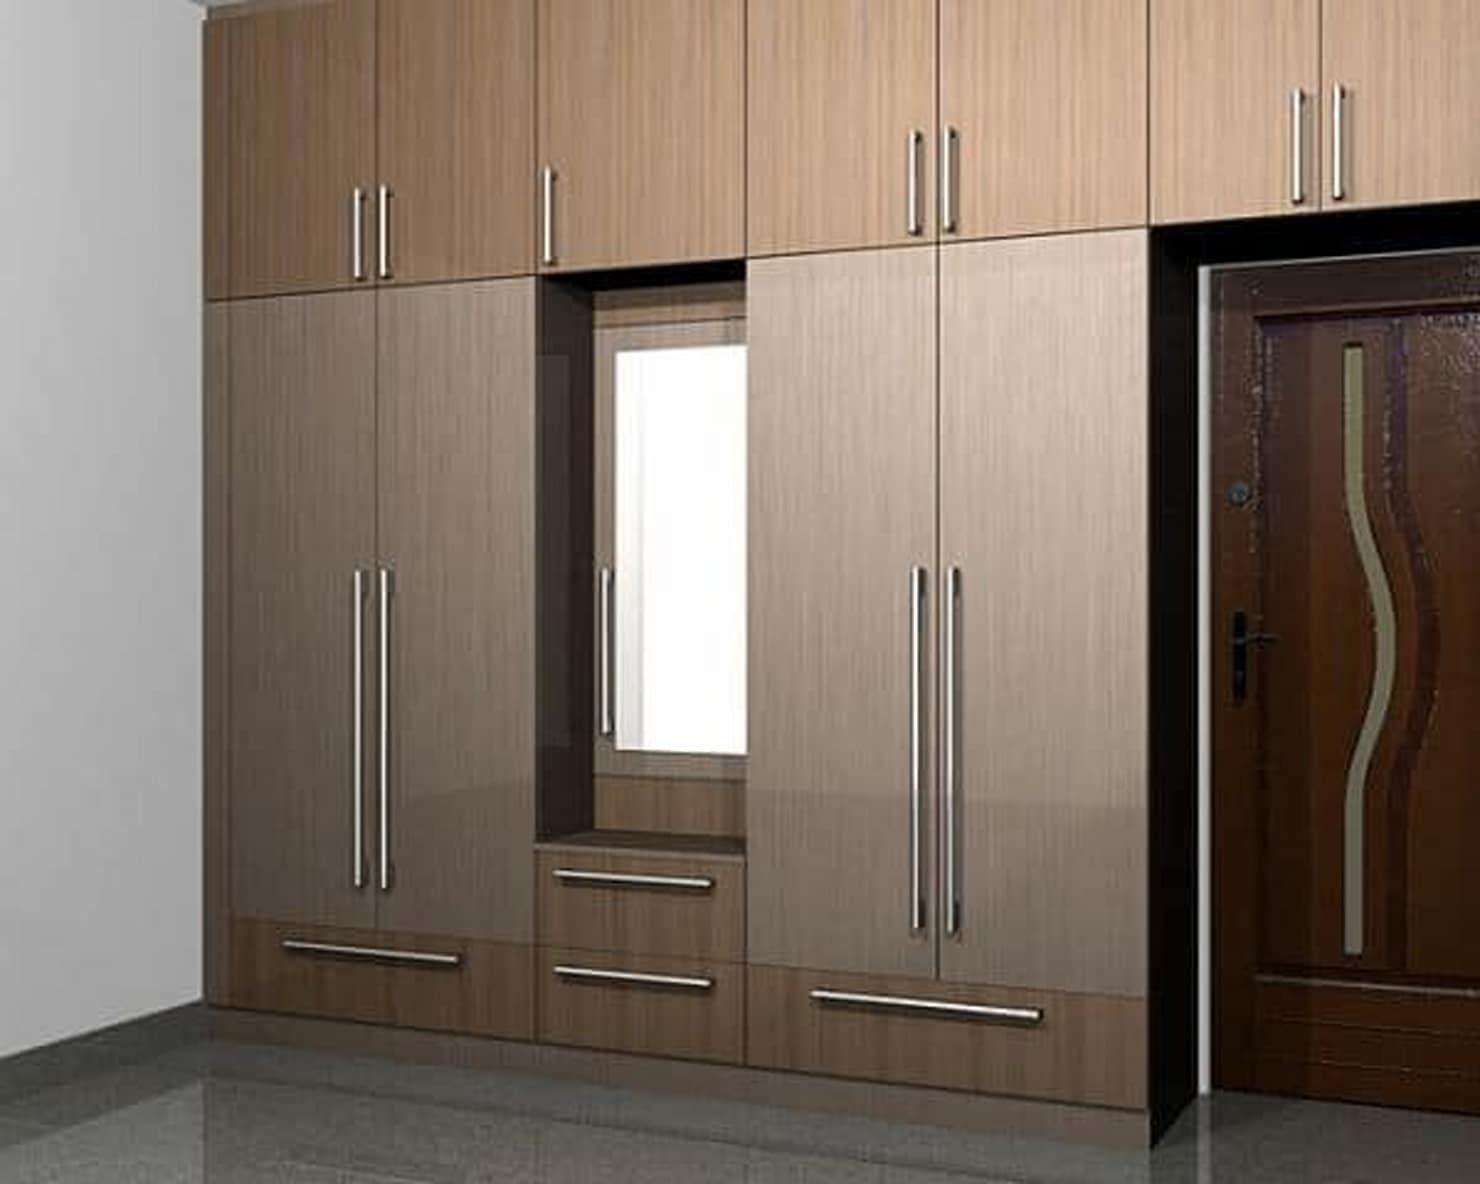 Home Interiors In Bangalore Bedroom By Max Interiors In 2019 Cupboard Design Bedroom Cupboard Designs Wardrobe Design Bedroom